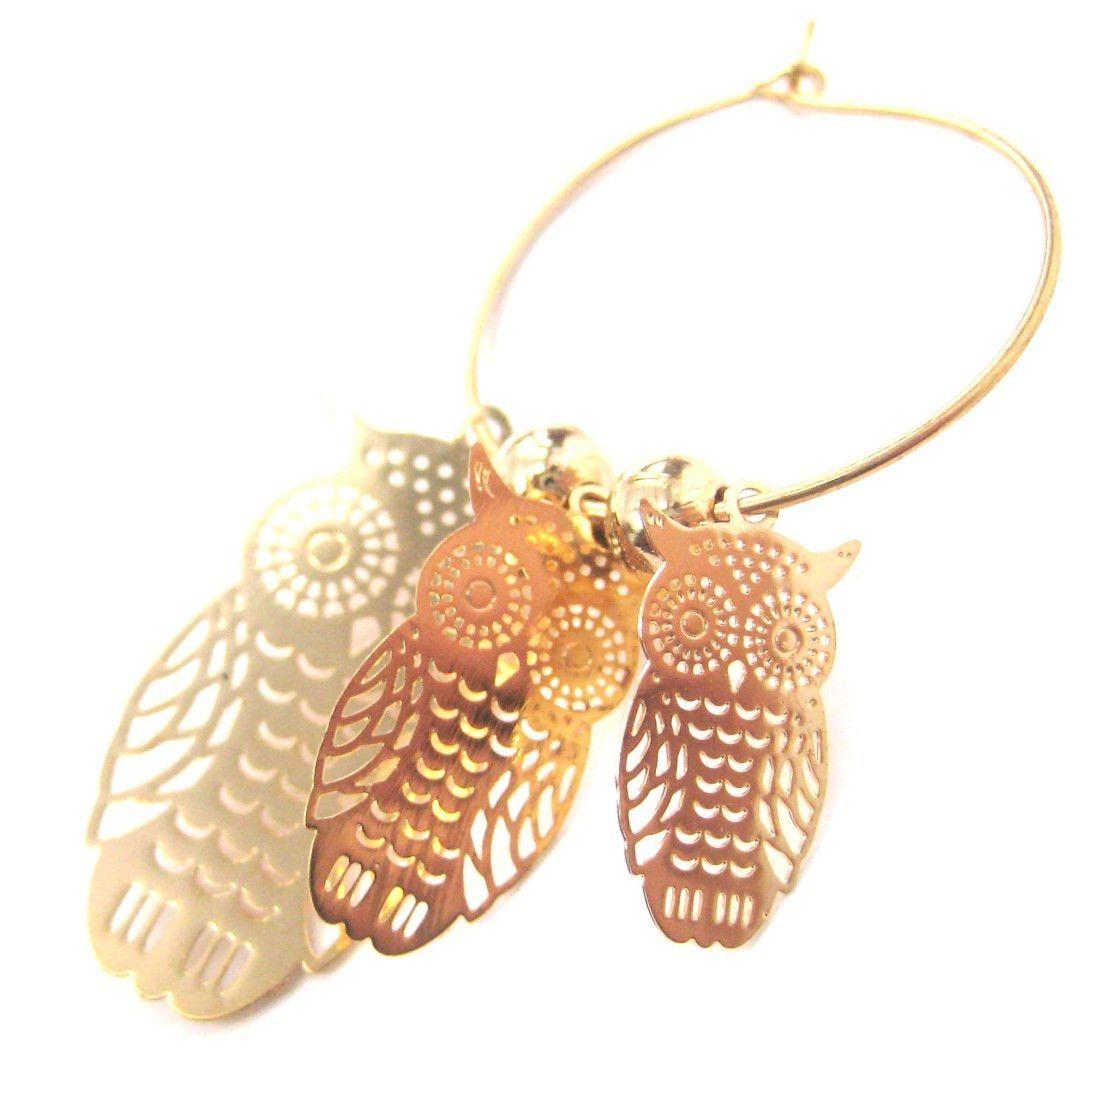 Owl Sillhouette Cut Out Shaped Dangle Hoop Earrings in Gold | Animal Jewelry